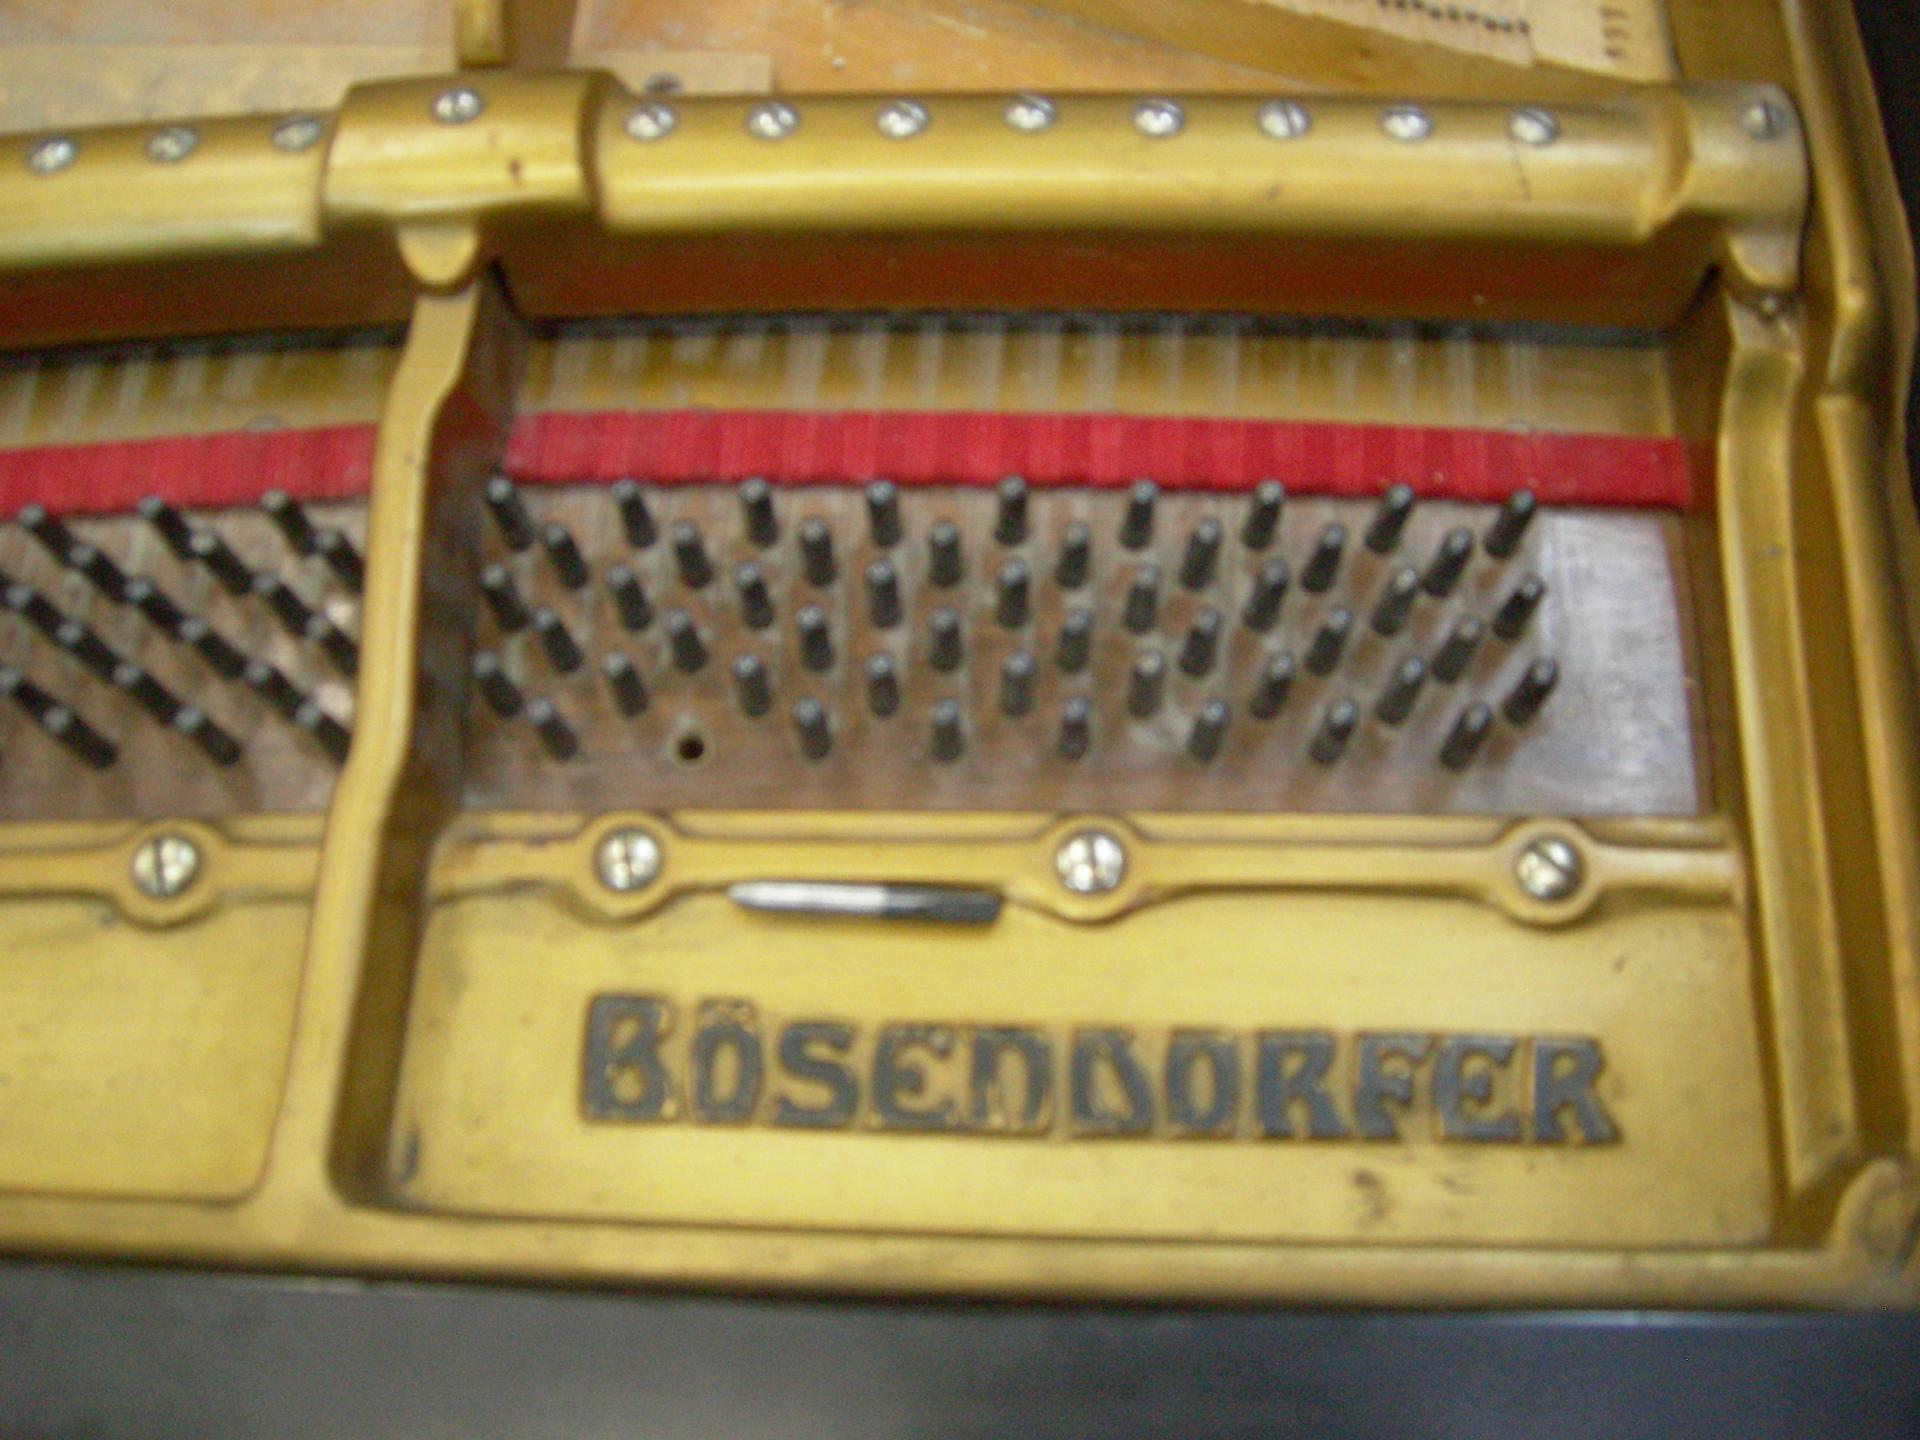 Bosendorfer avant